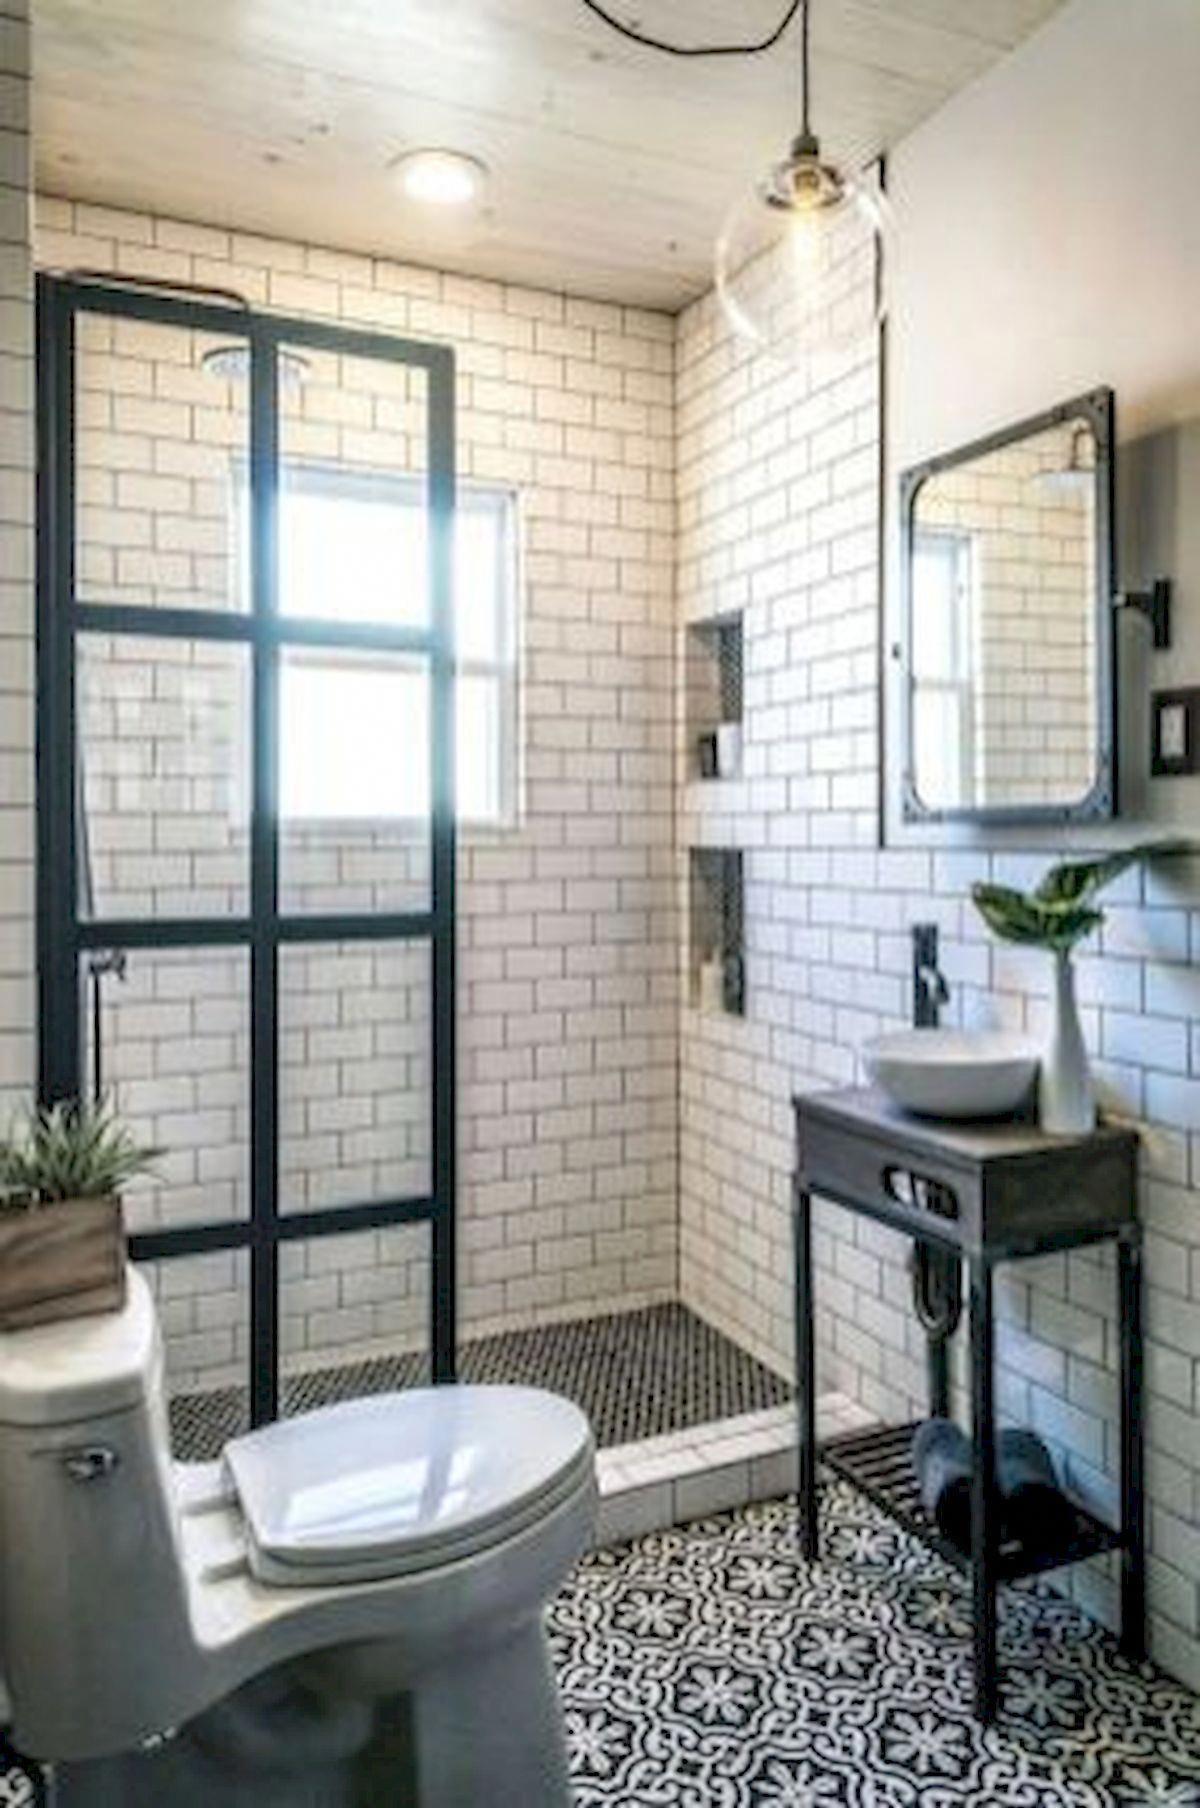 What Color Bathroom Fixtures Are In Style Bathroomrenovations Bathroom Designs Small Bathroom Remodel Bathroom Design Small Bathrooms Remodel